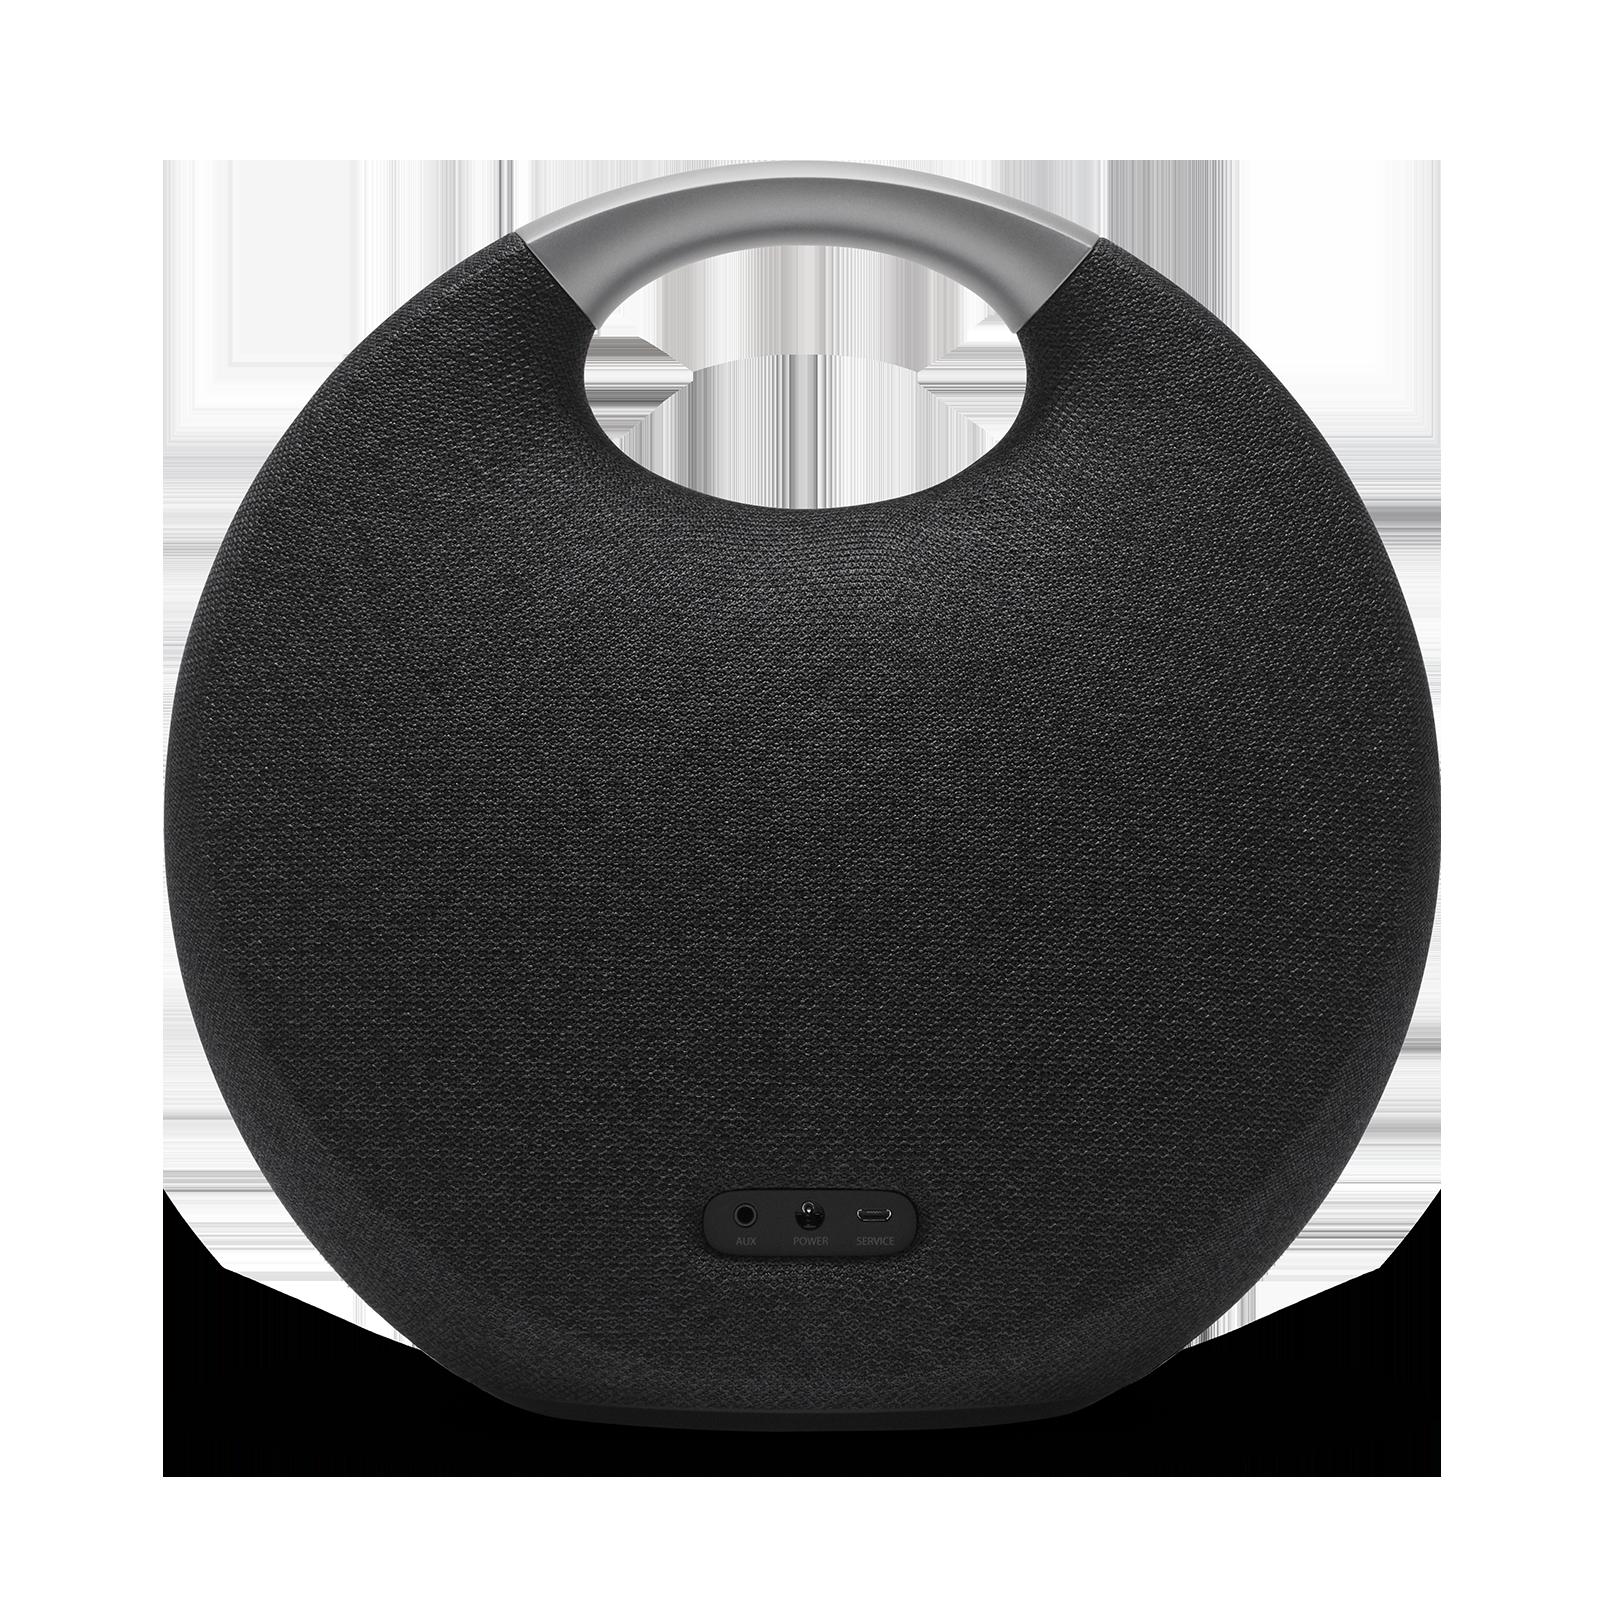 Onyx Studio 5 - Black - Portable Bluetooth Speaker - Back